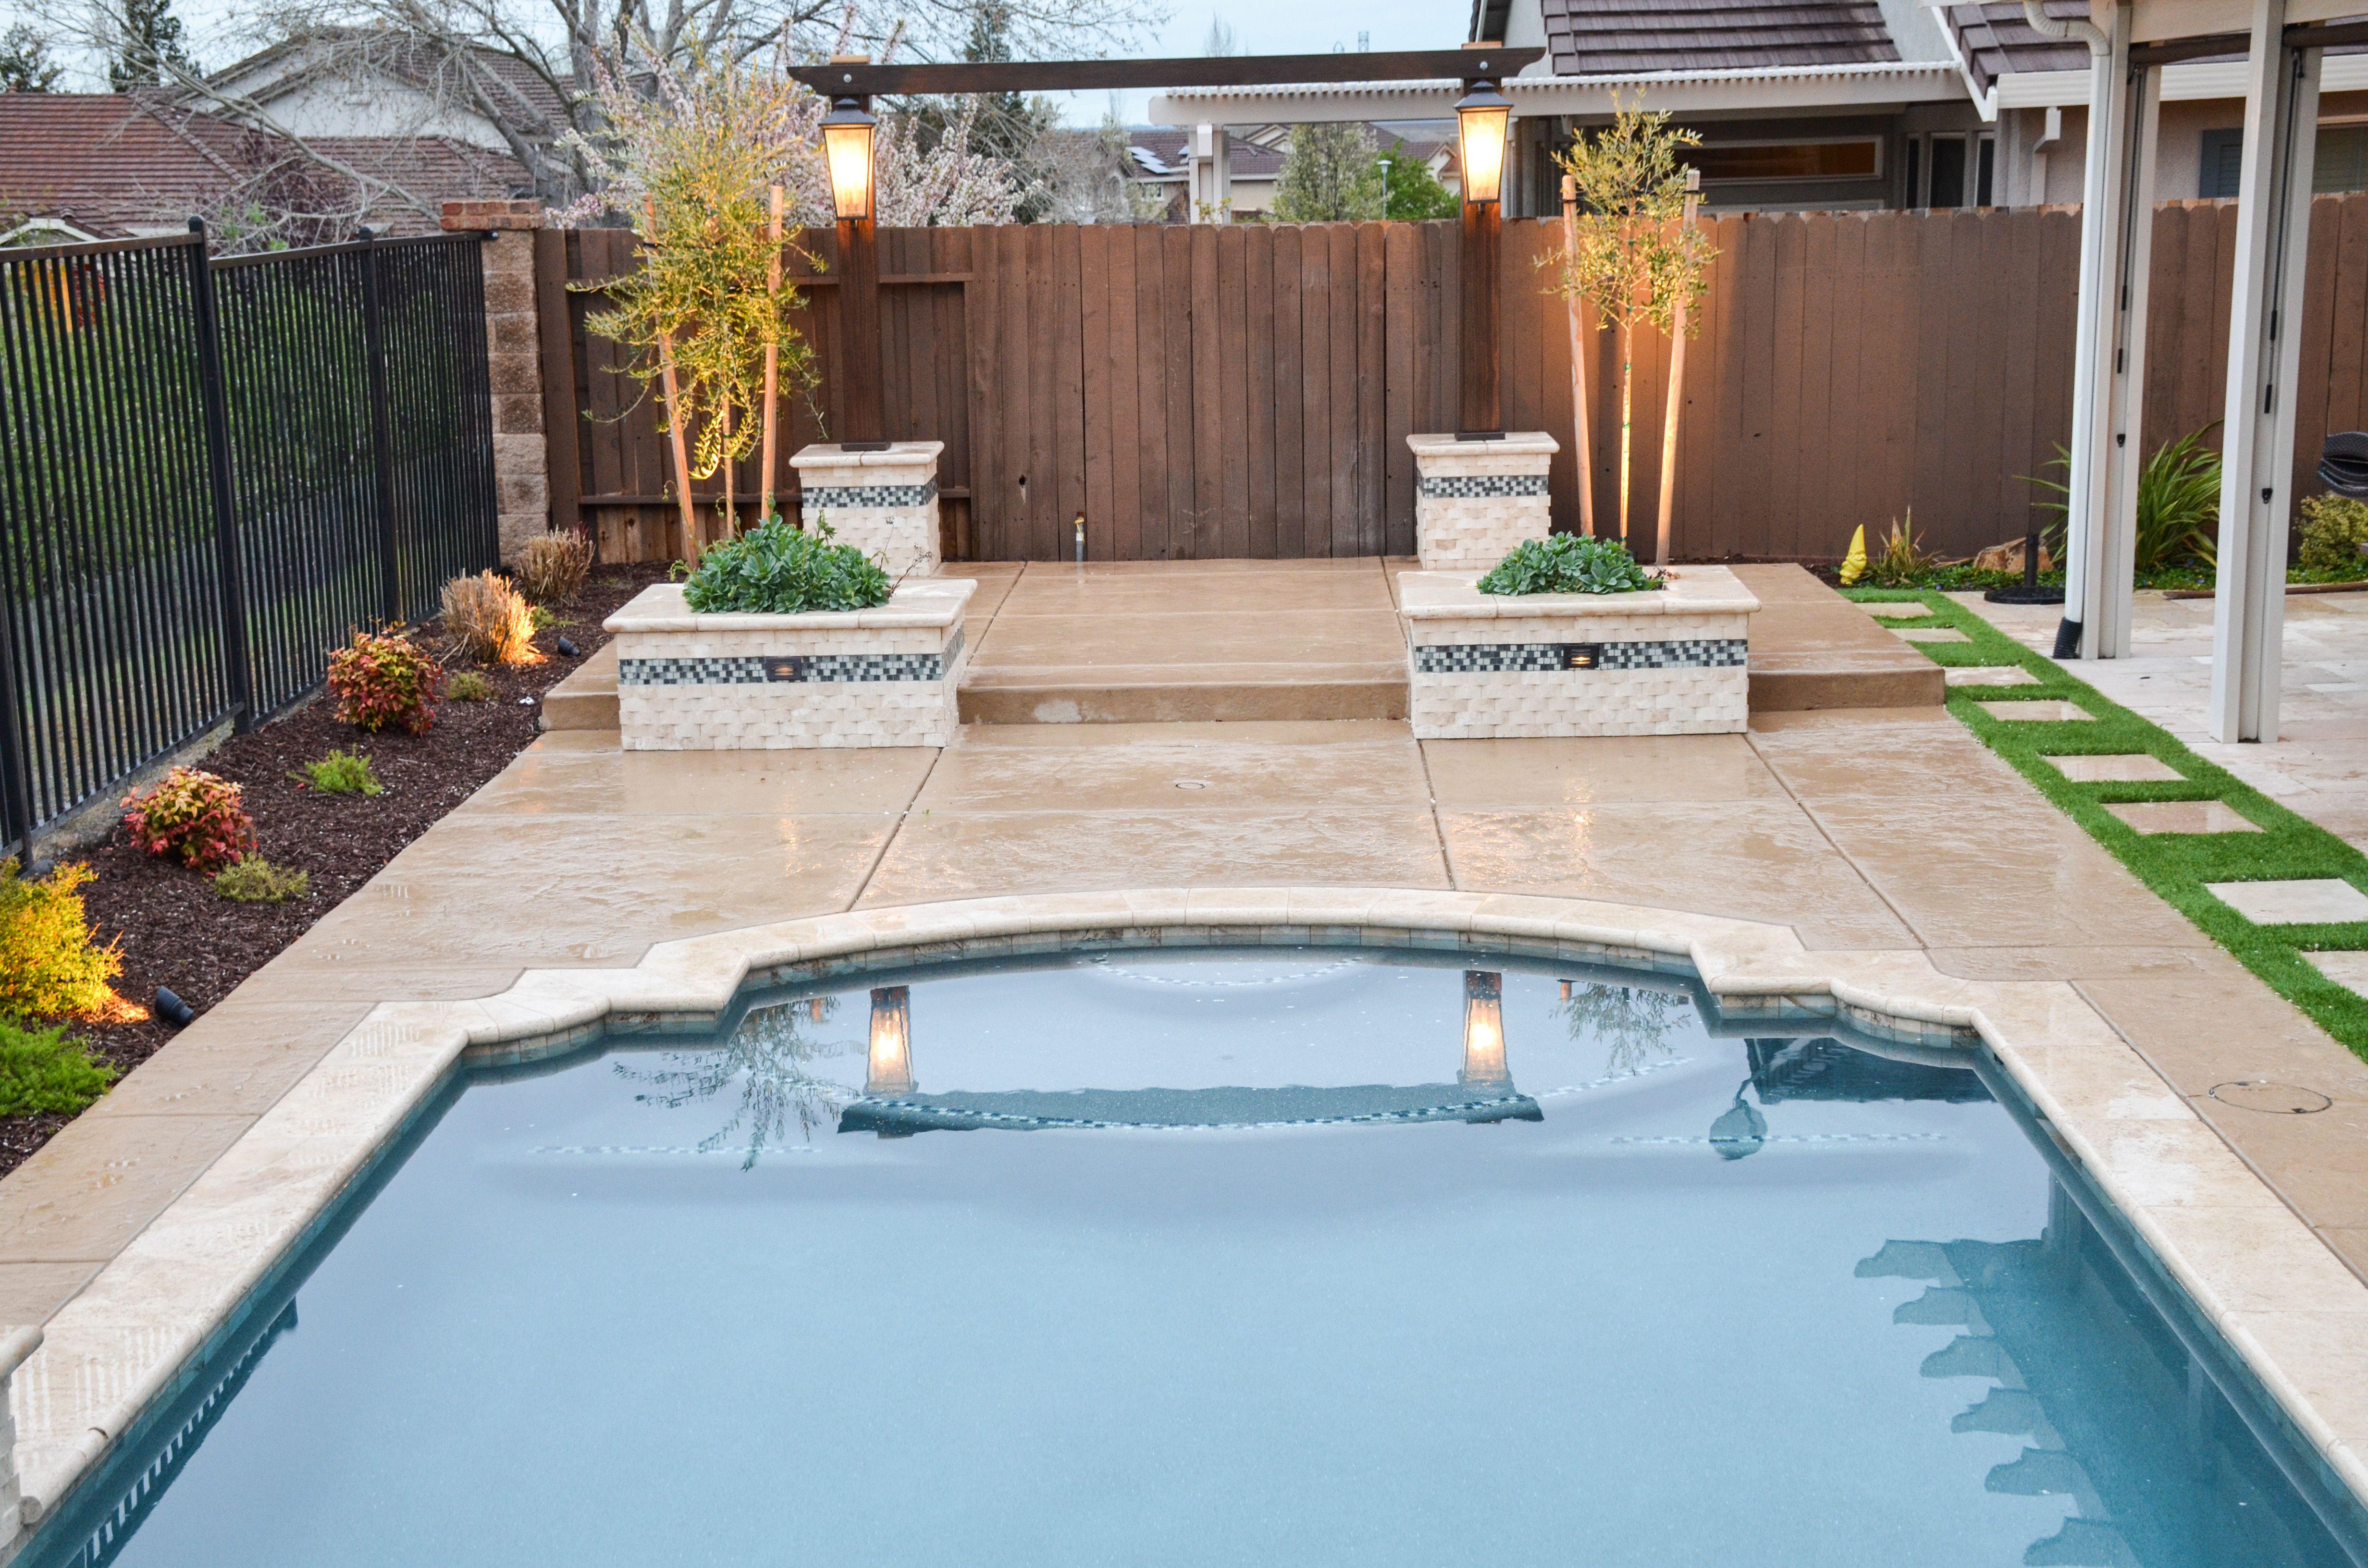 Geometric Pool Design By Premier Pools In Folsom Ca This Pool